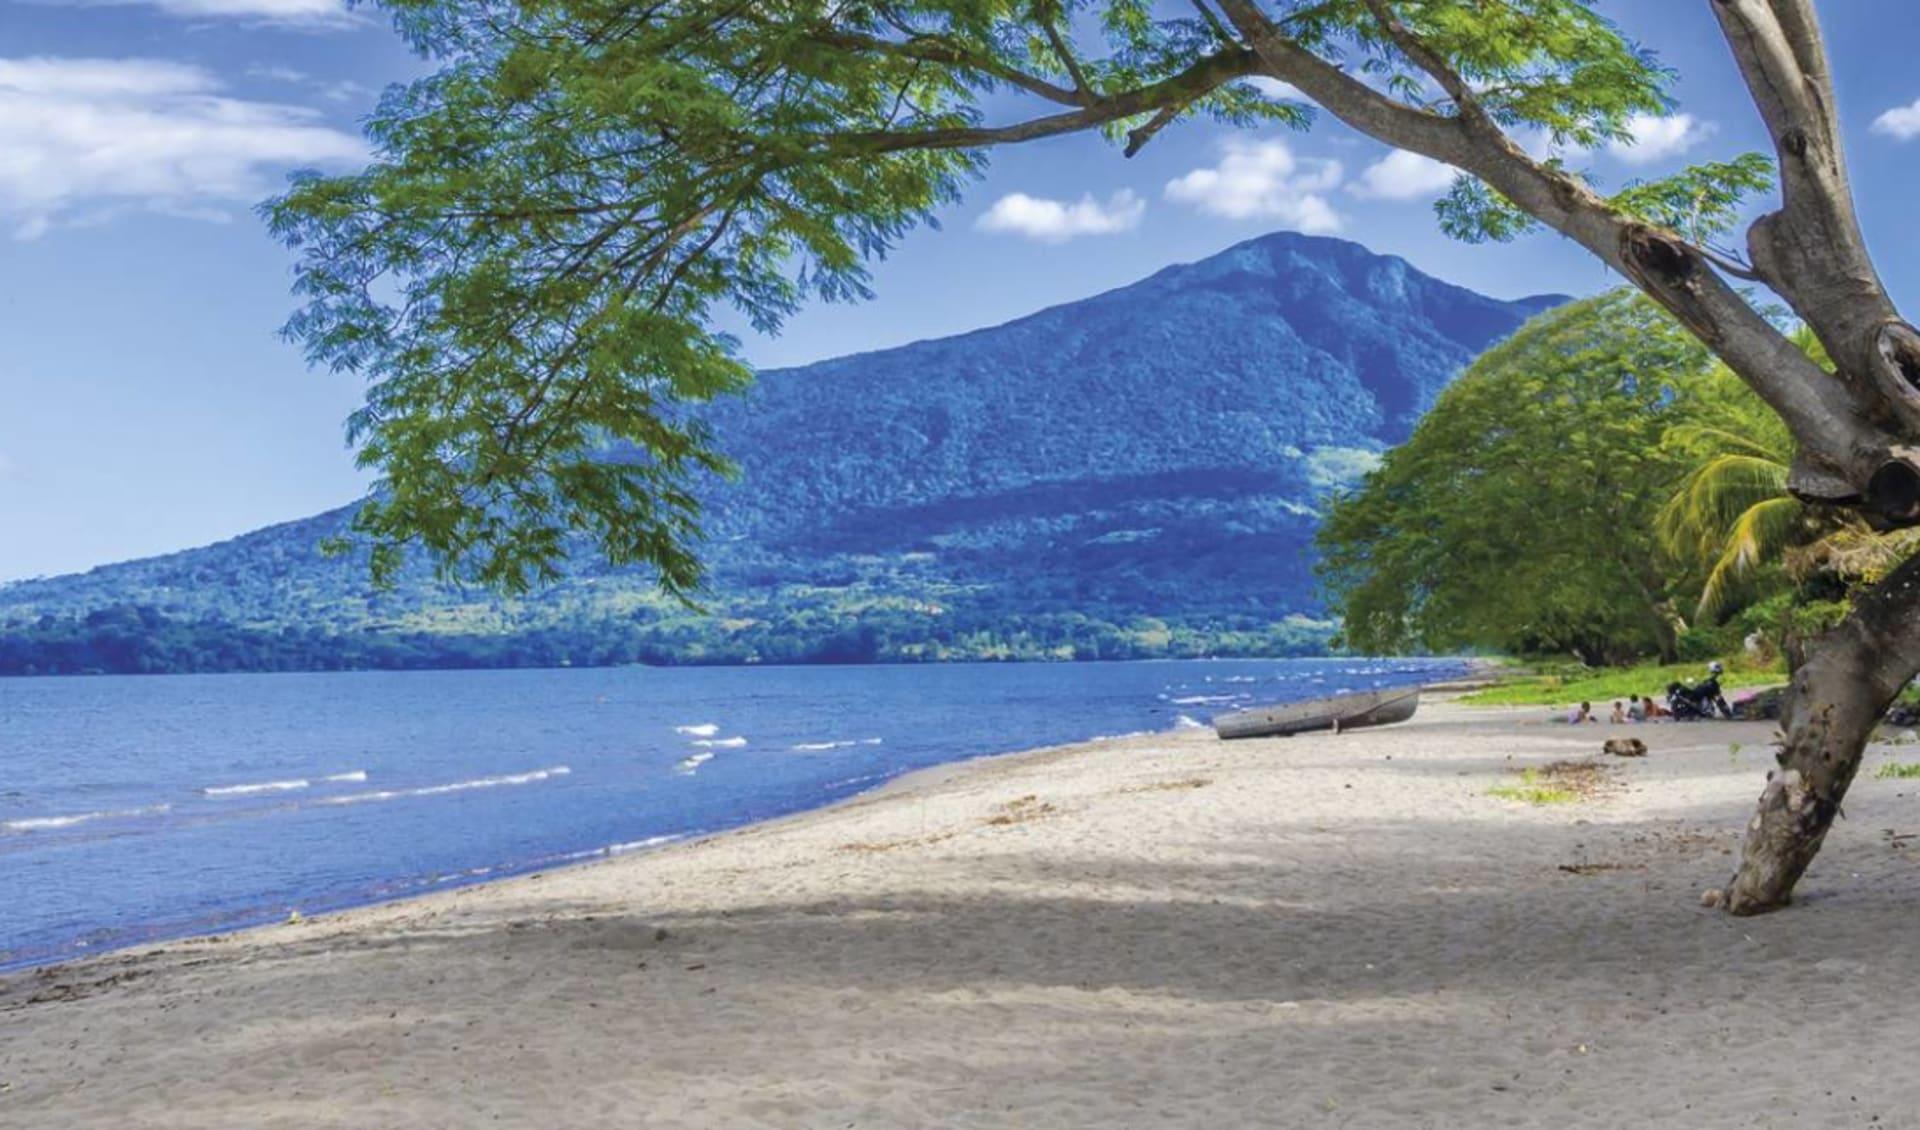 Gruppenreise Höhepunkte Nicaragua ab Managua: Nicaragua - Ometepe - Strand mit Blick auf Vulkan